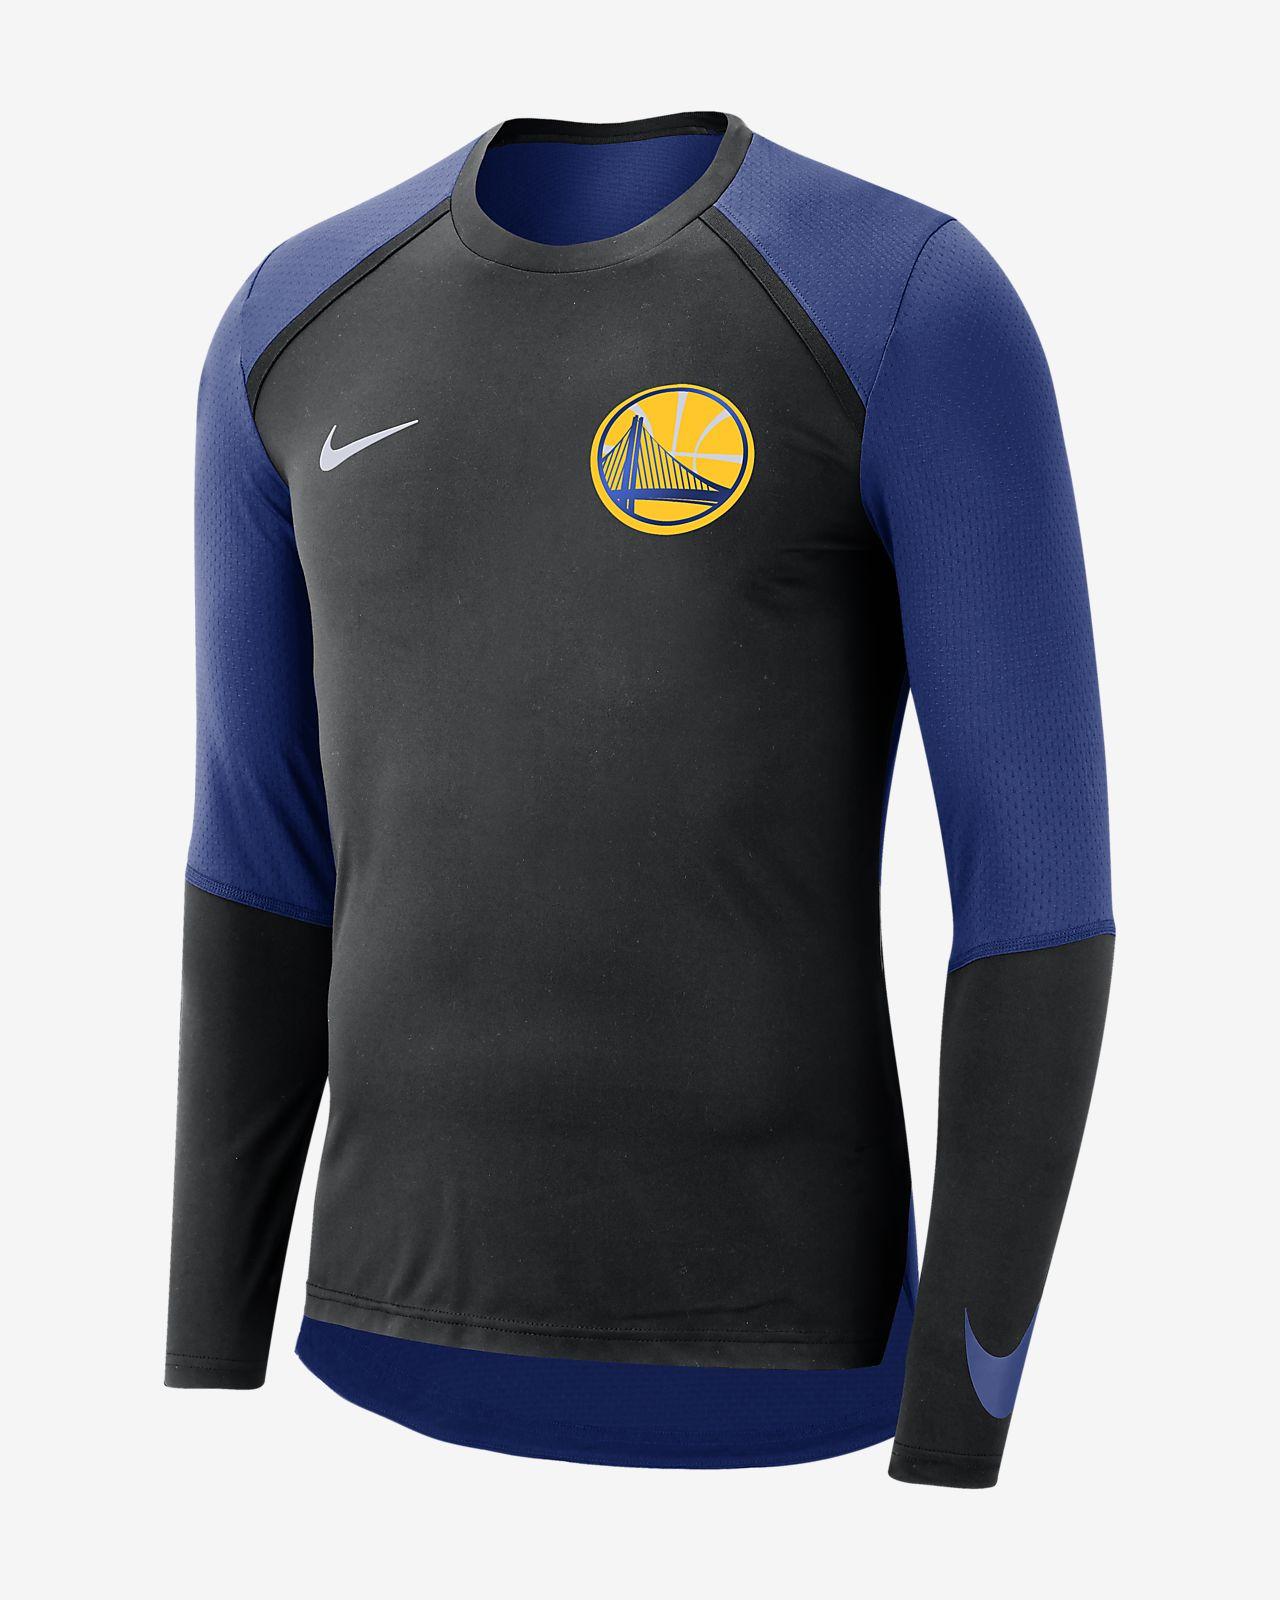 c685442de0c Golden State Warriors Nike Dri-FIT Men s Long-Sleeve NBA Top. Nike.com